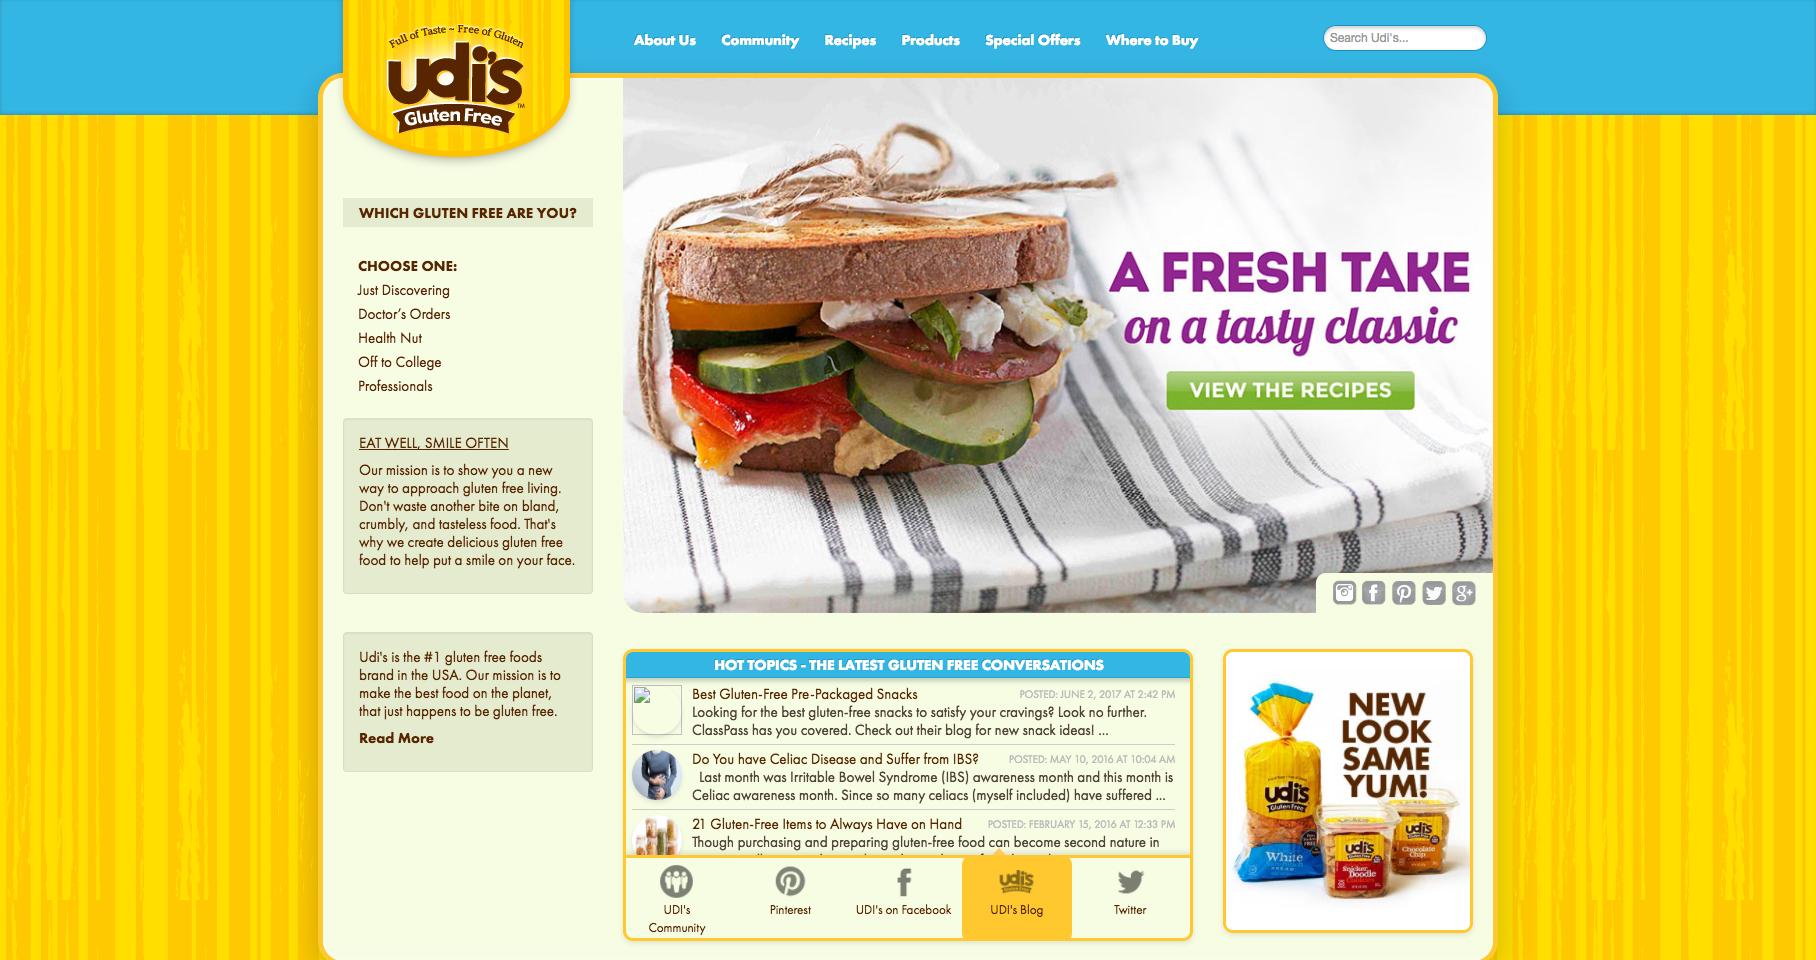 udis_gluten_free.png